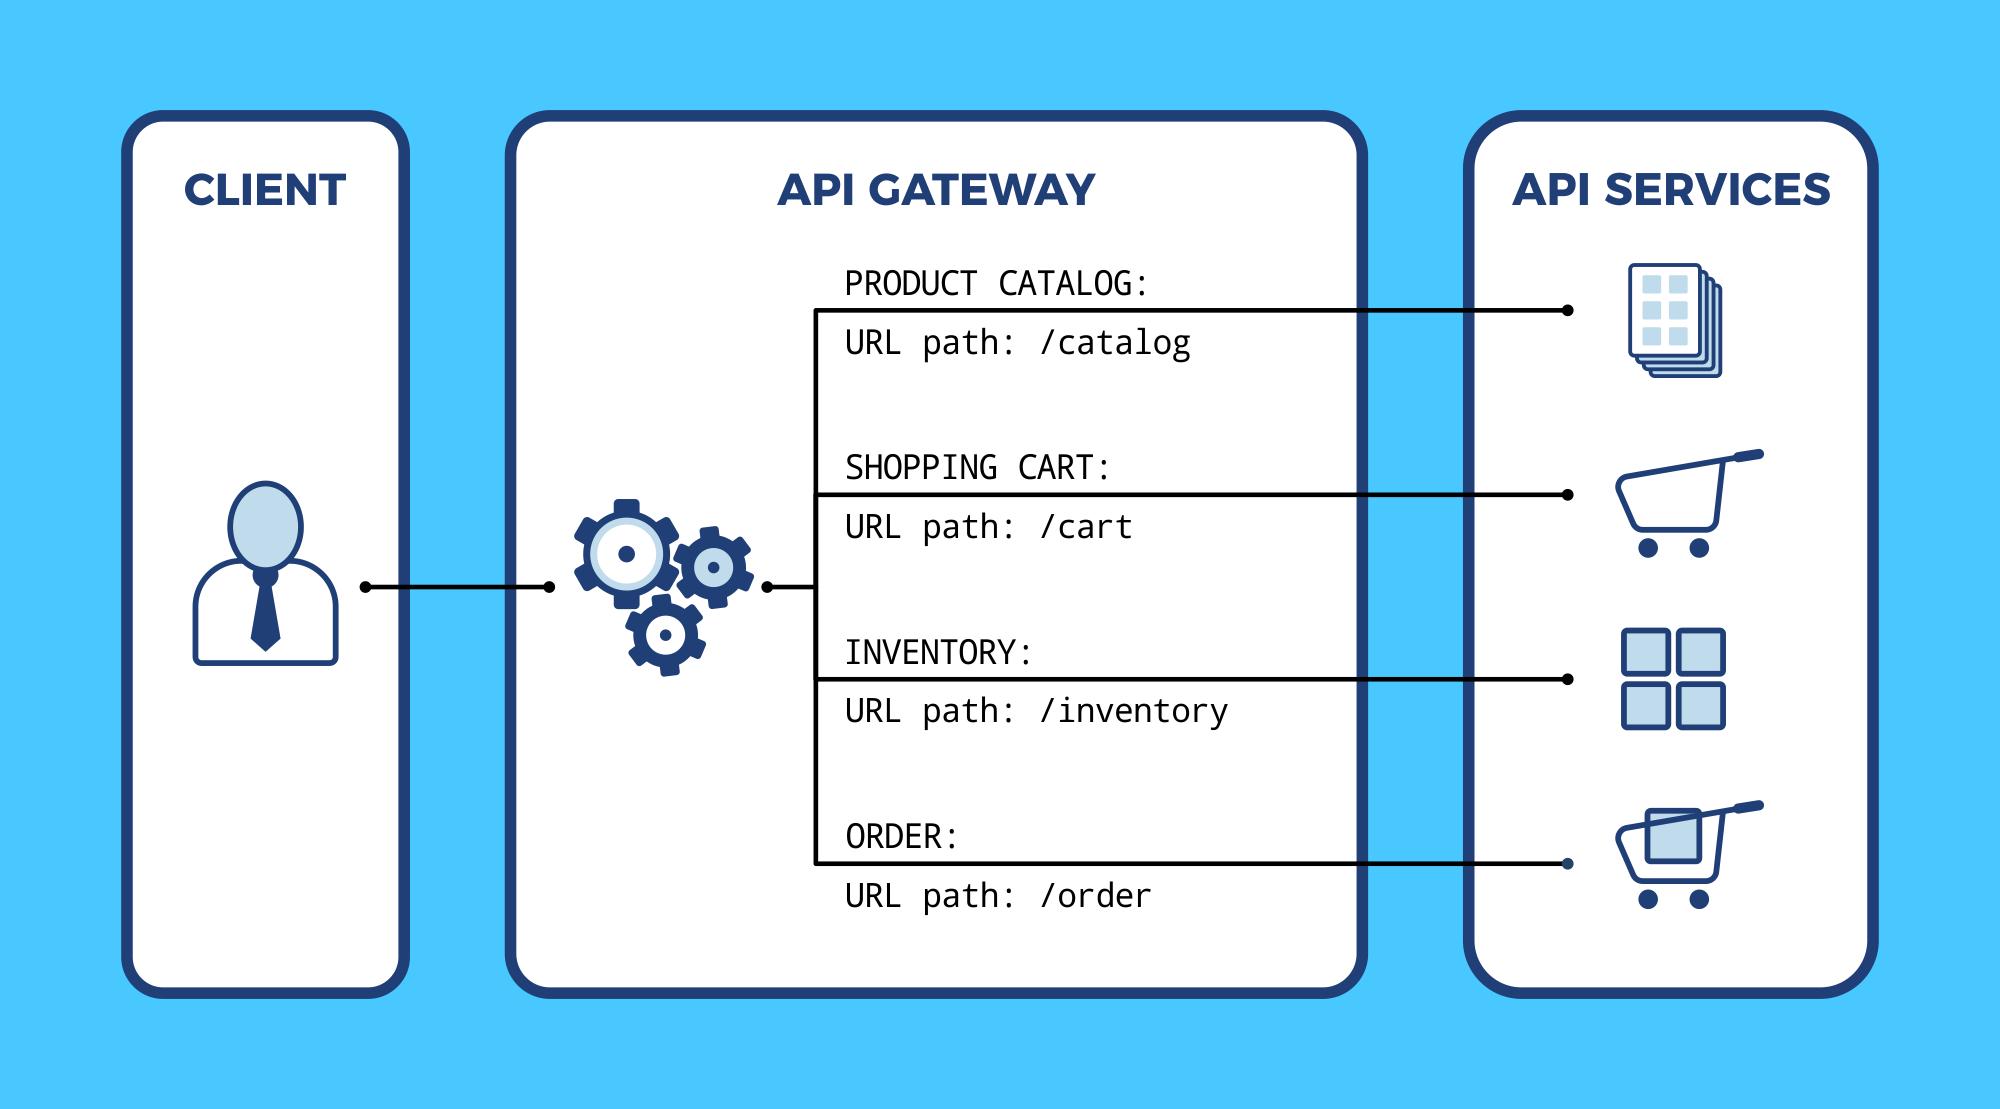 haproxy api gateway